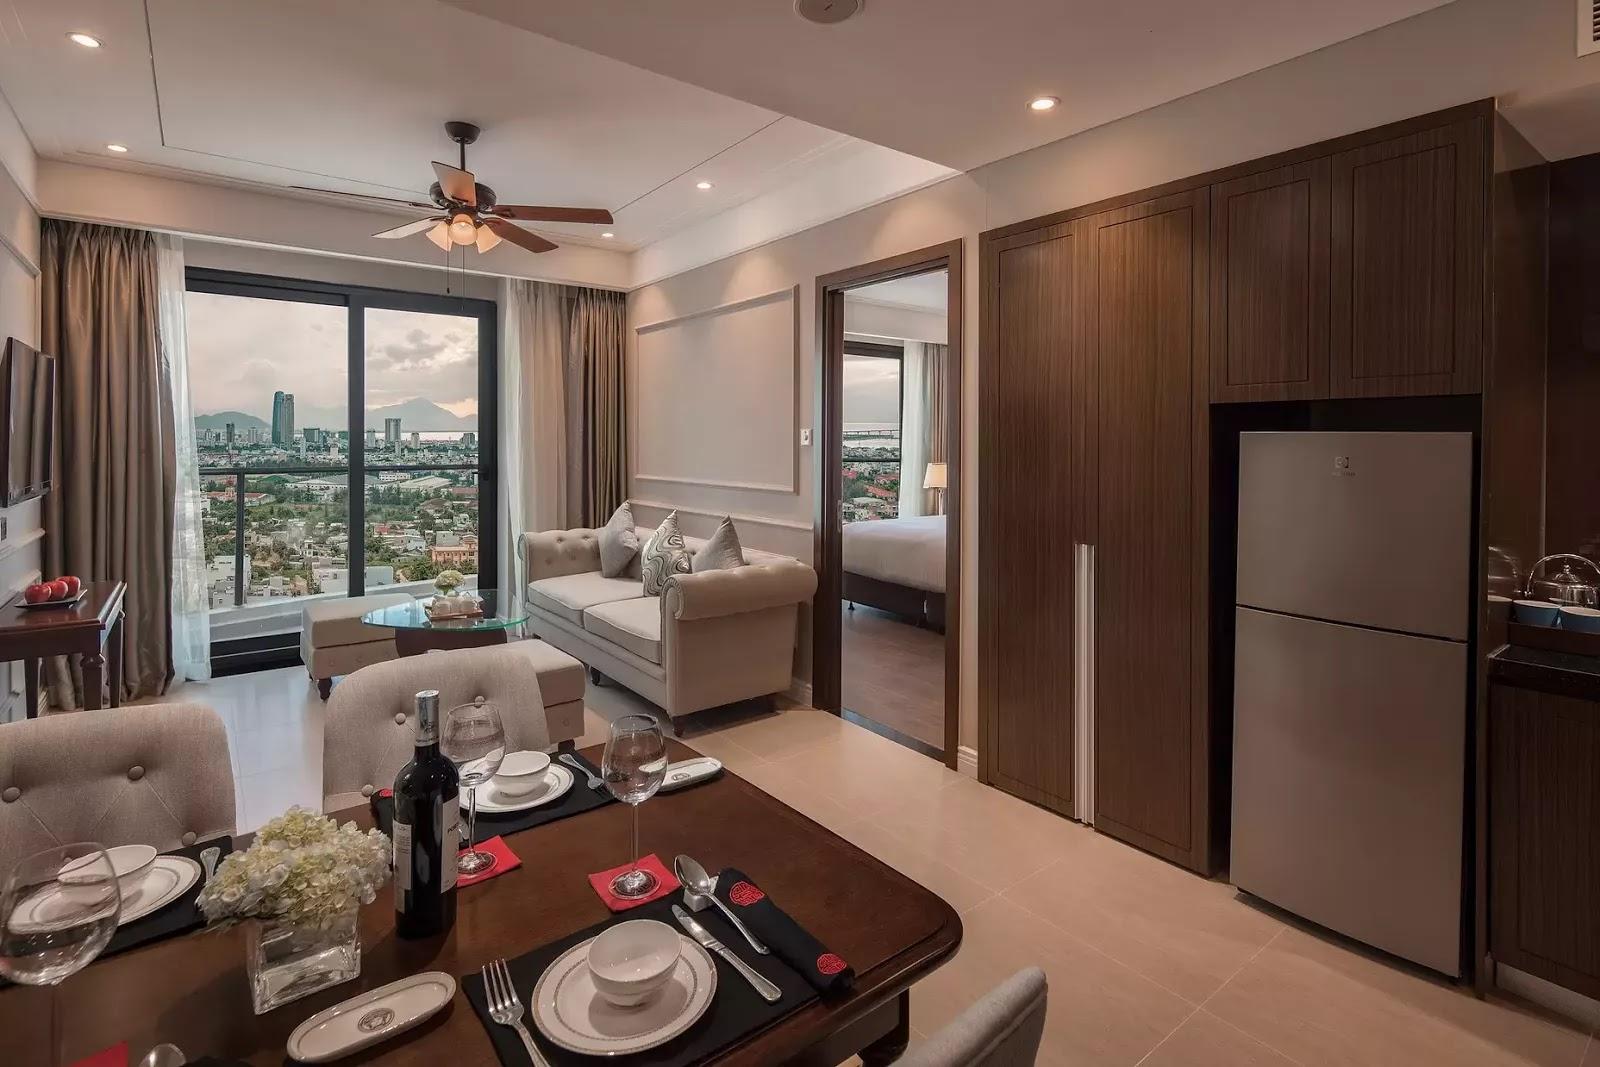 Căn hộ số 10 của Luxury Apartment